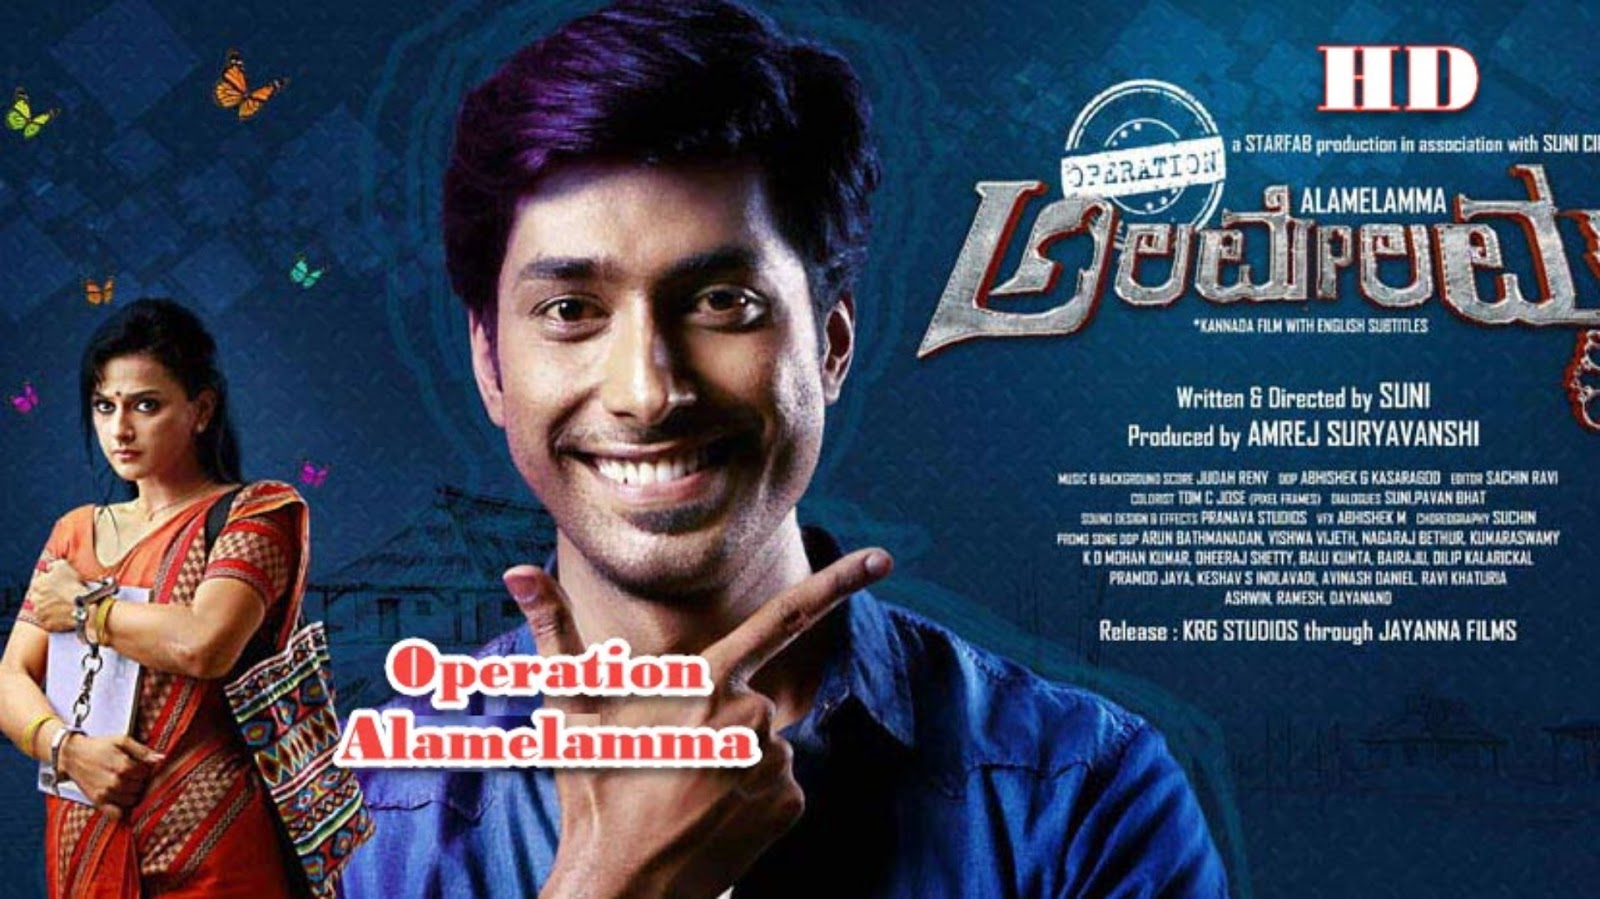 Oparation Alamelamma Kannada Film All Song Lyrics | ZooZInfo